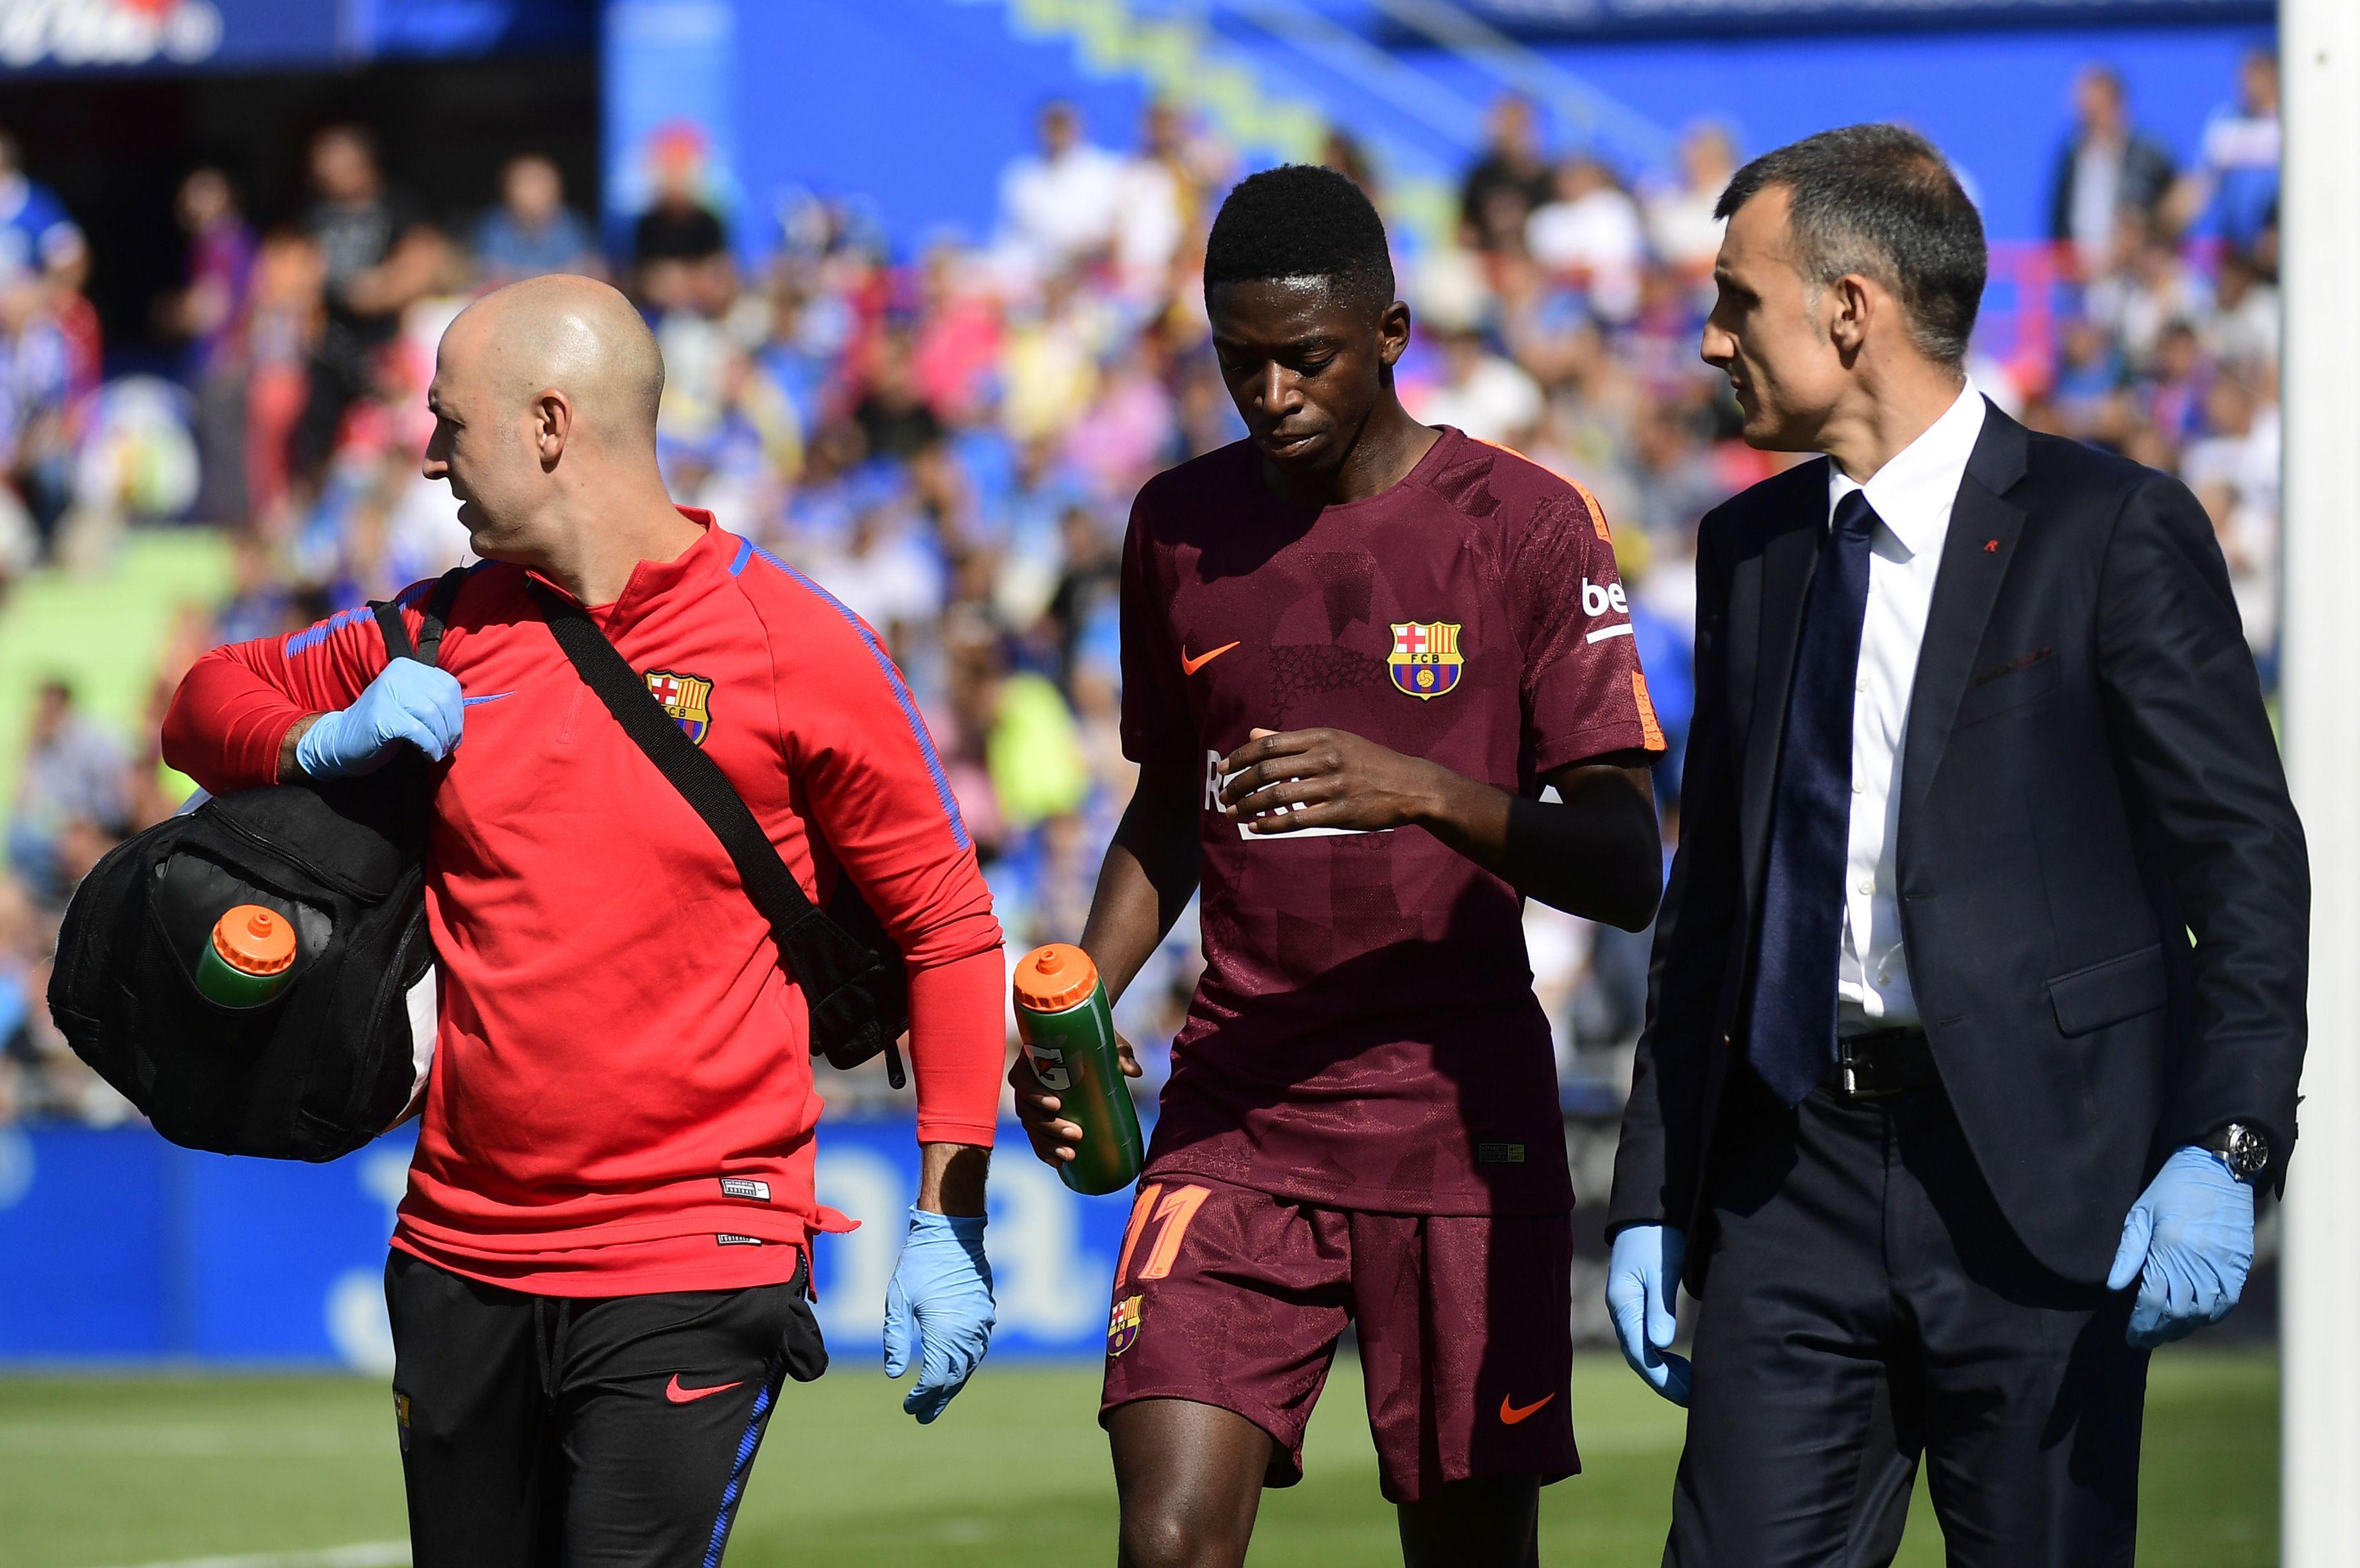 Ousmane Dembele walks off after suffering a hamstring injury at Getafe